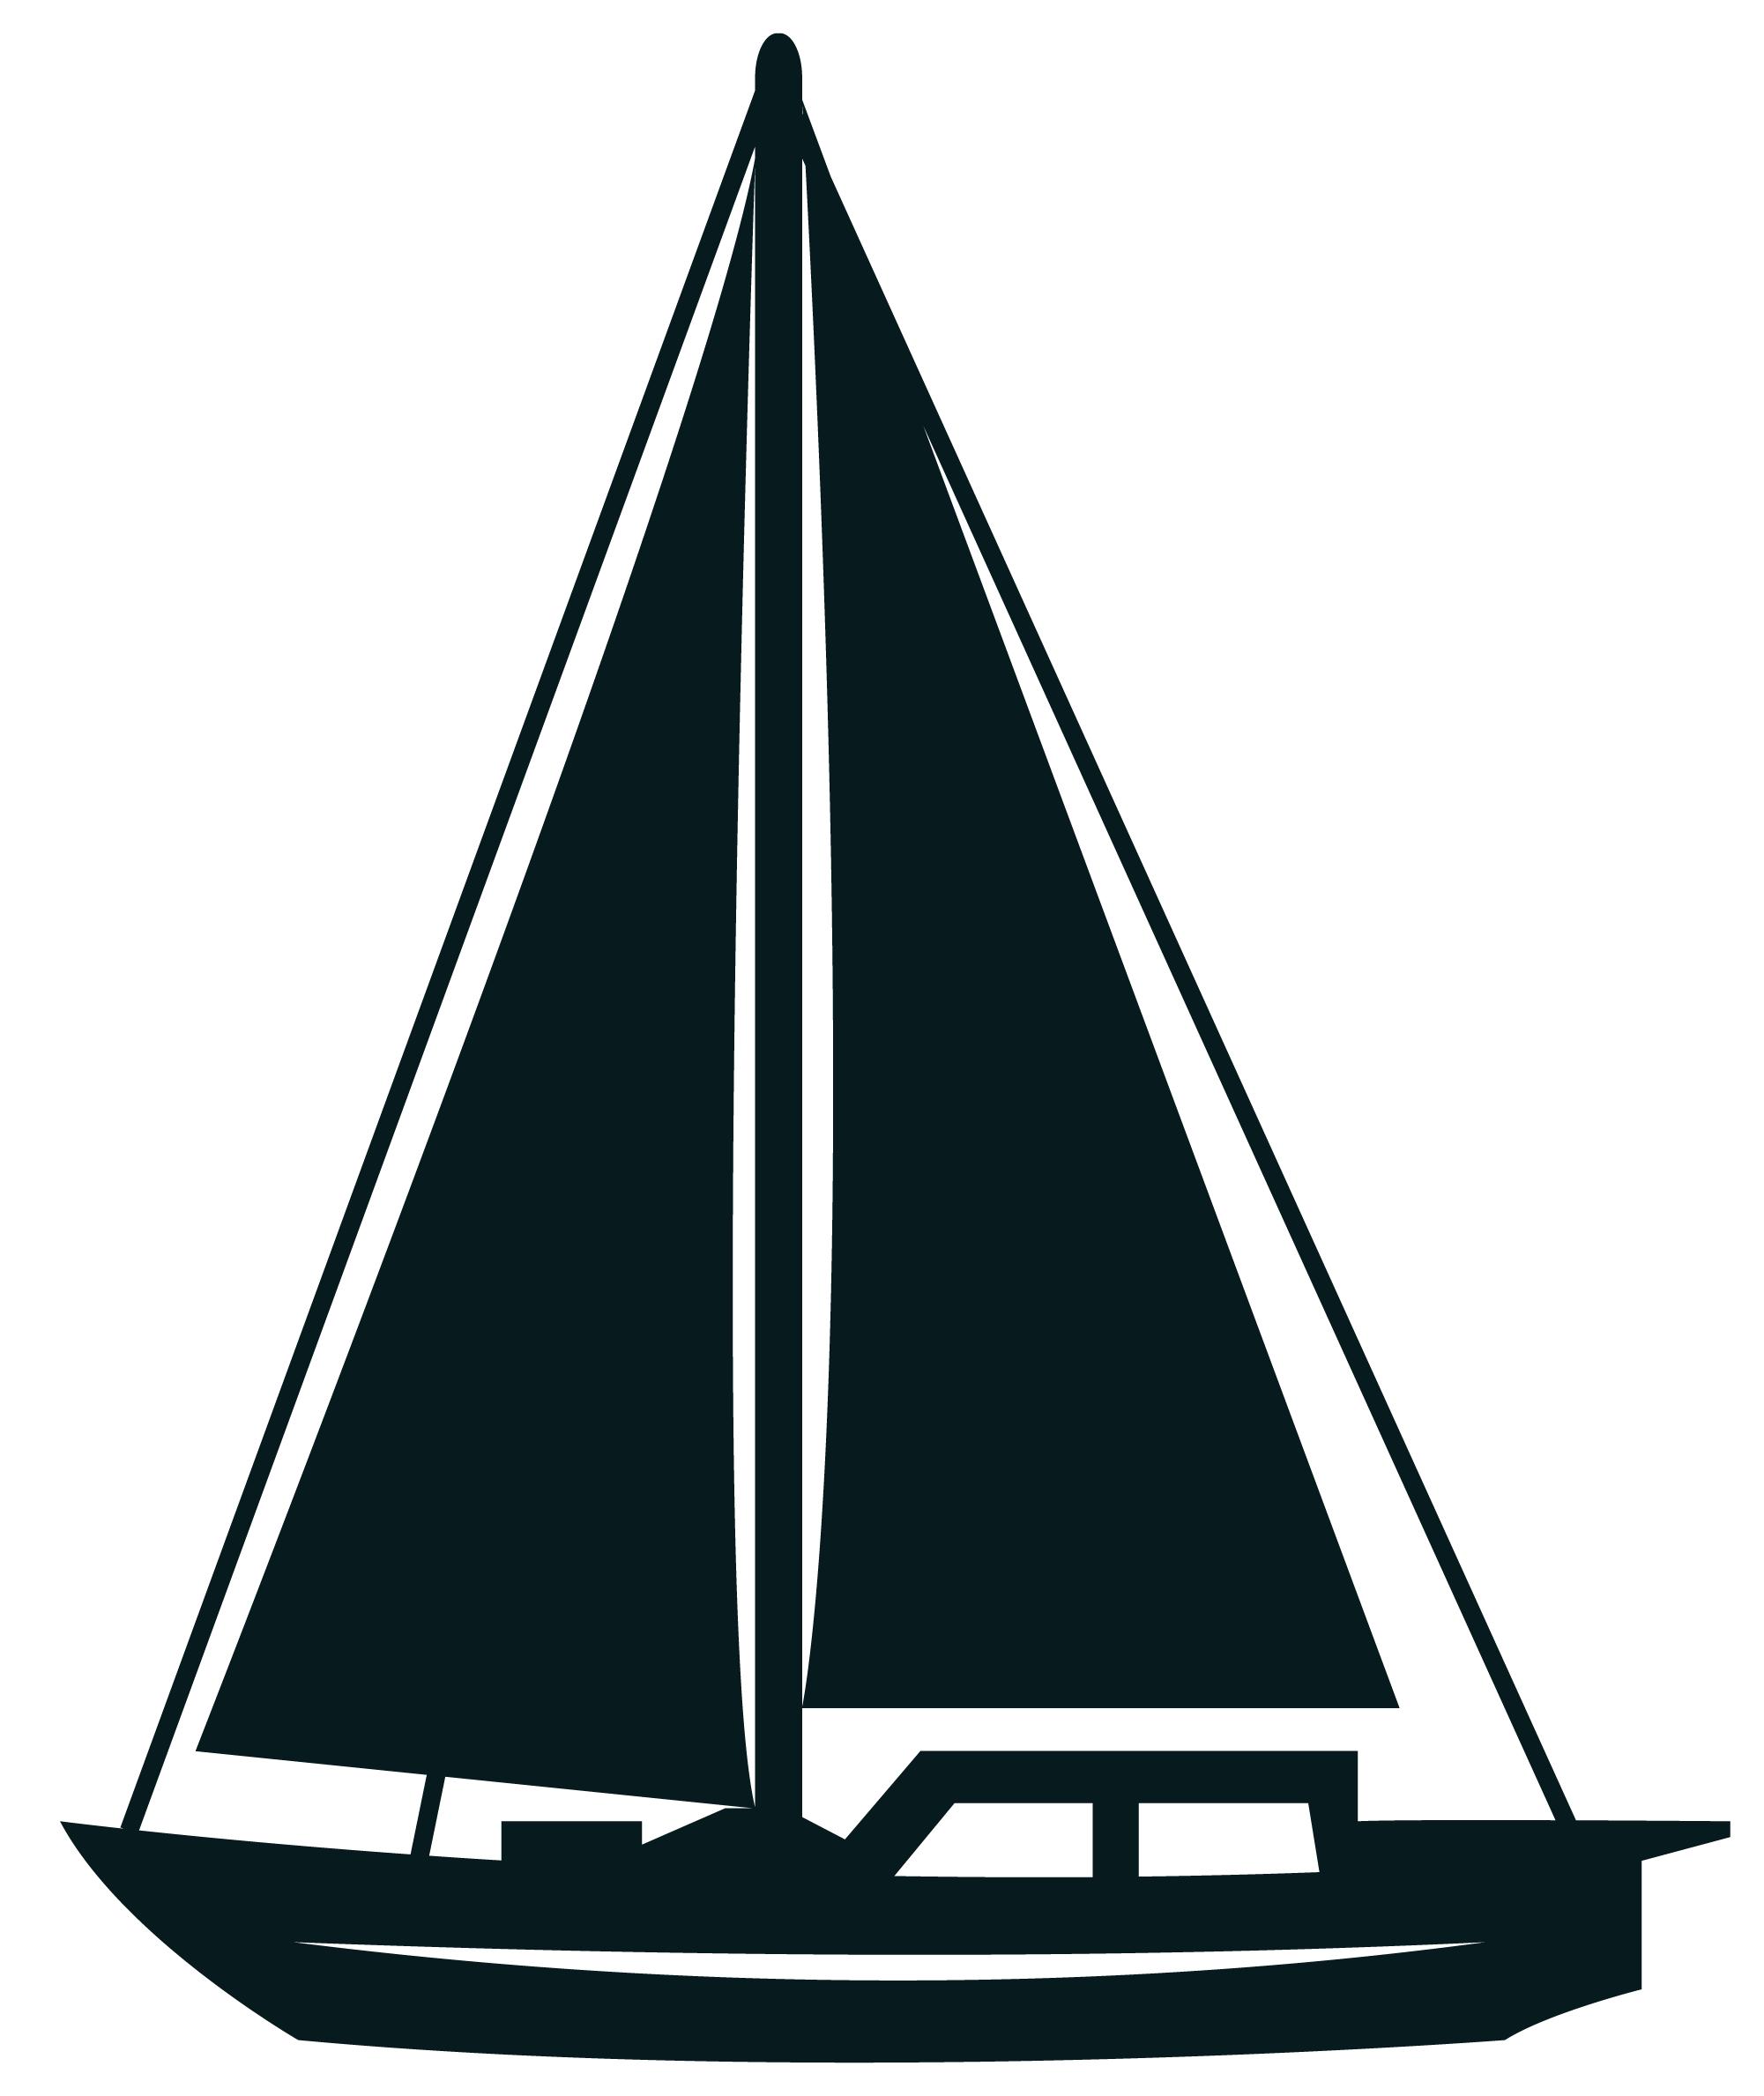 Sailing ship clip art. Orange clipart sailboat